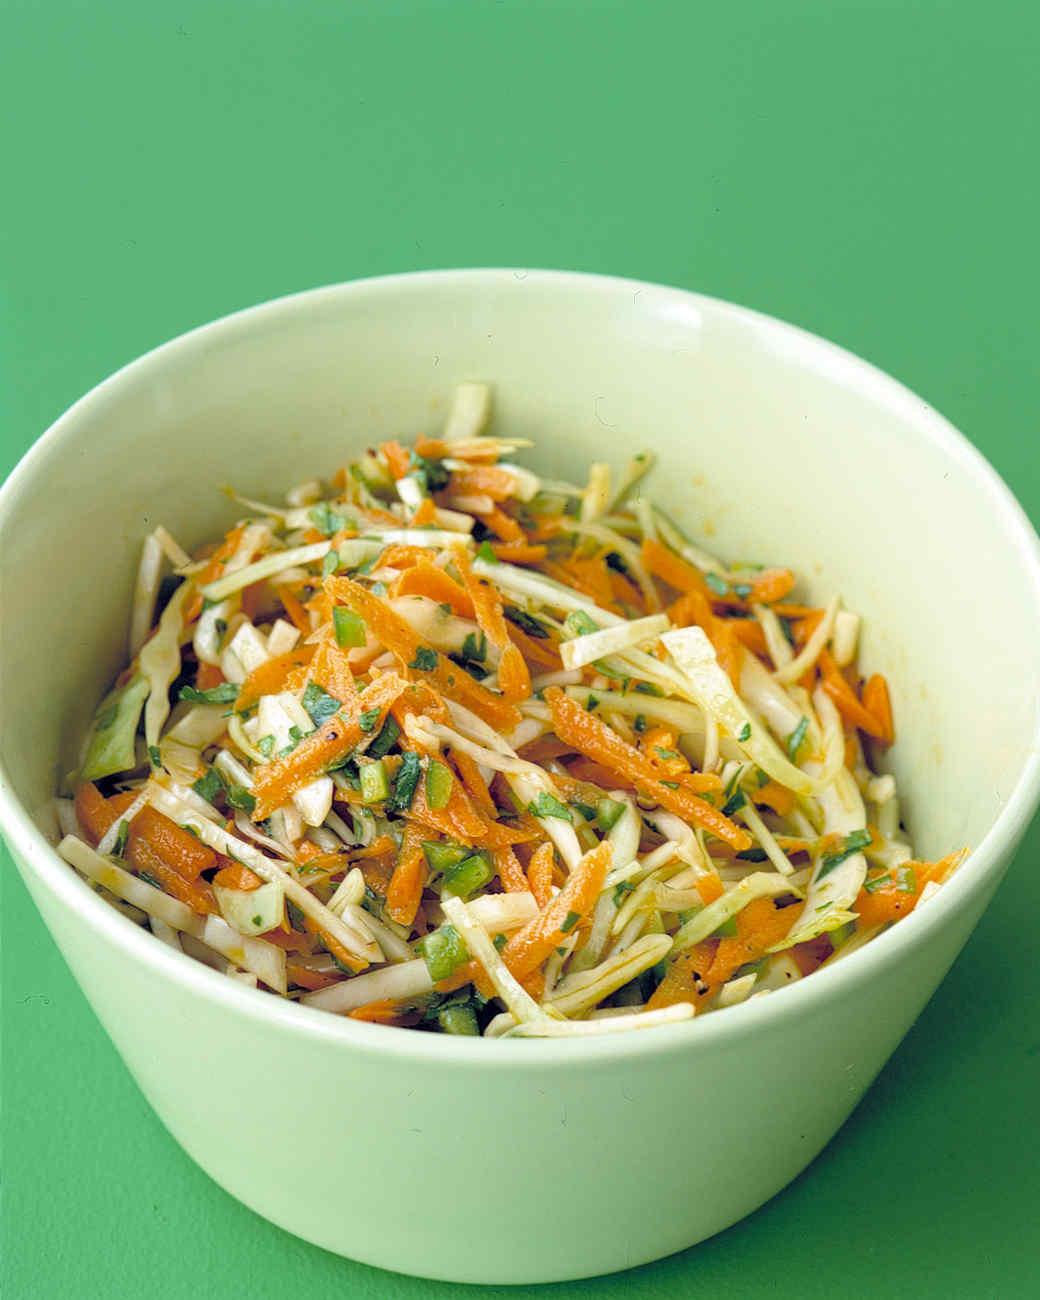 Carrot-Cumin Slaw